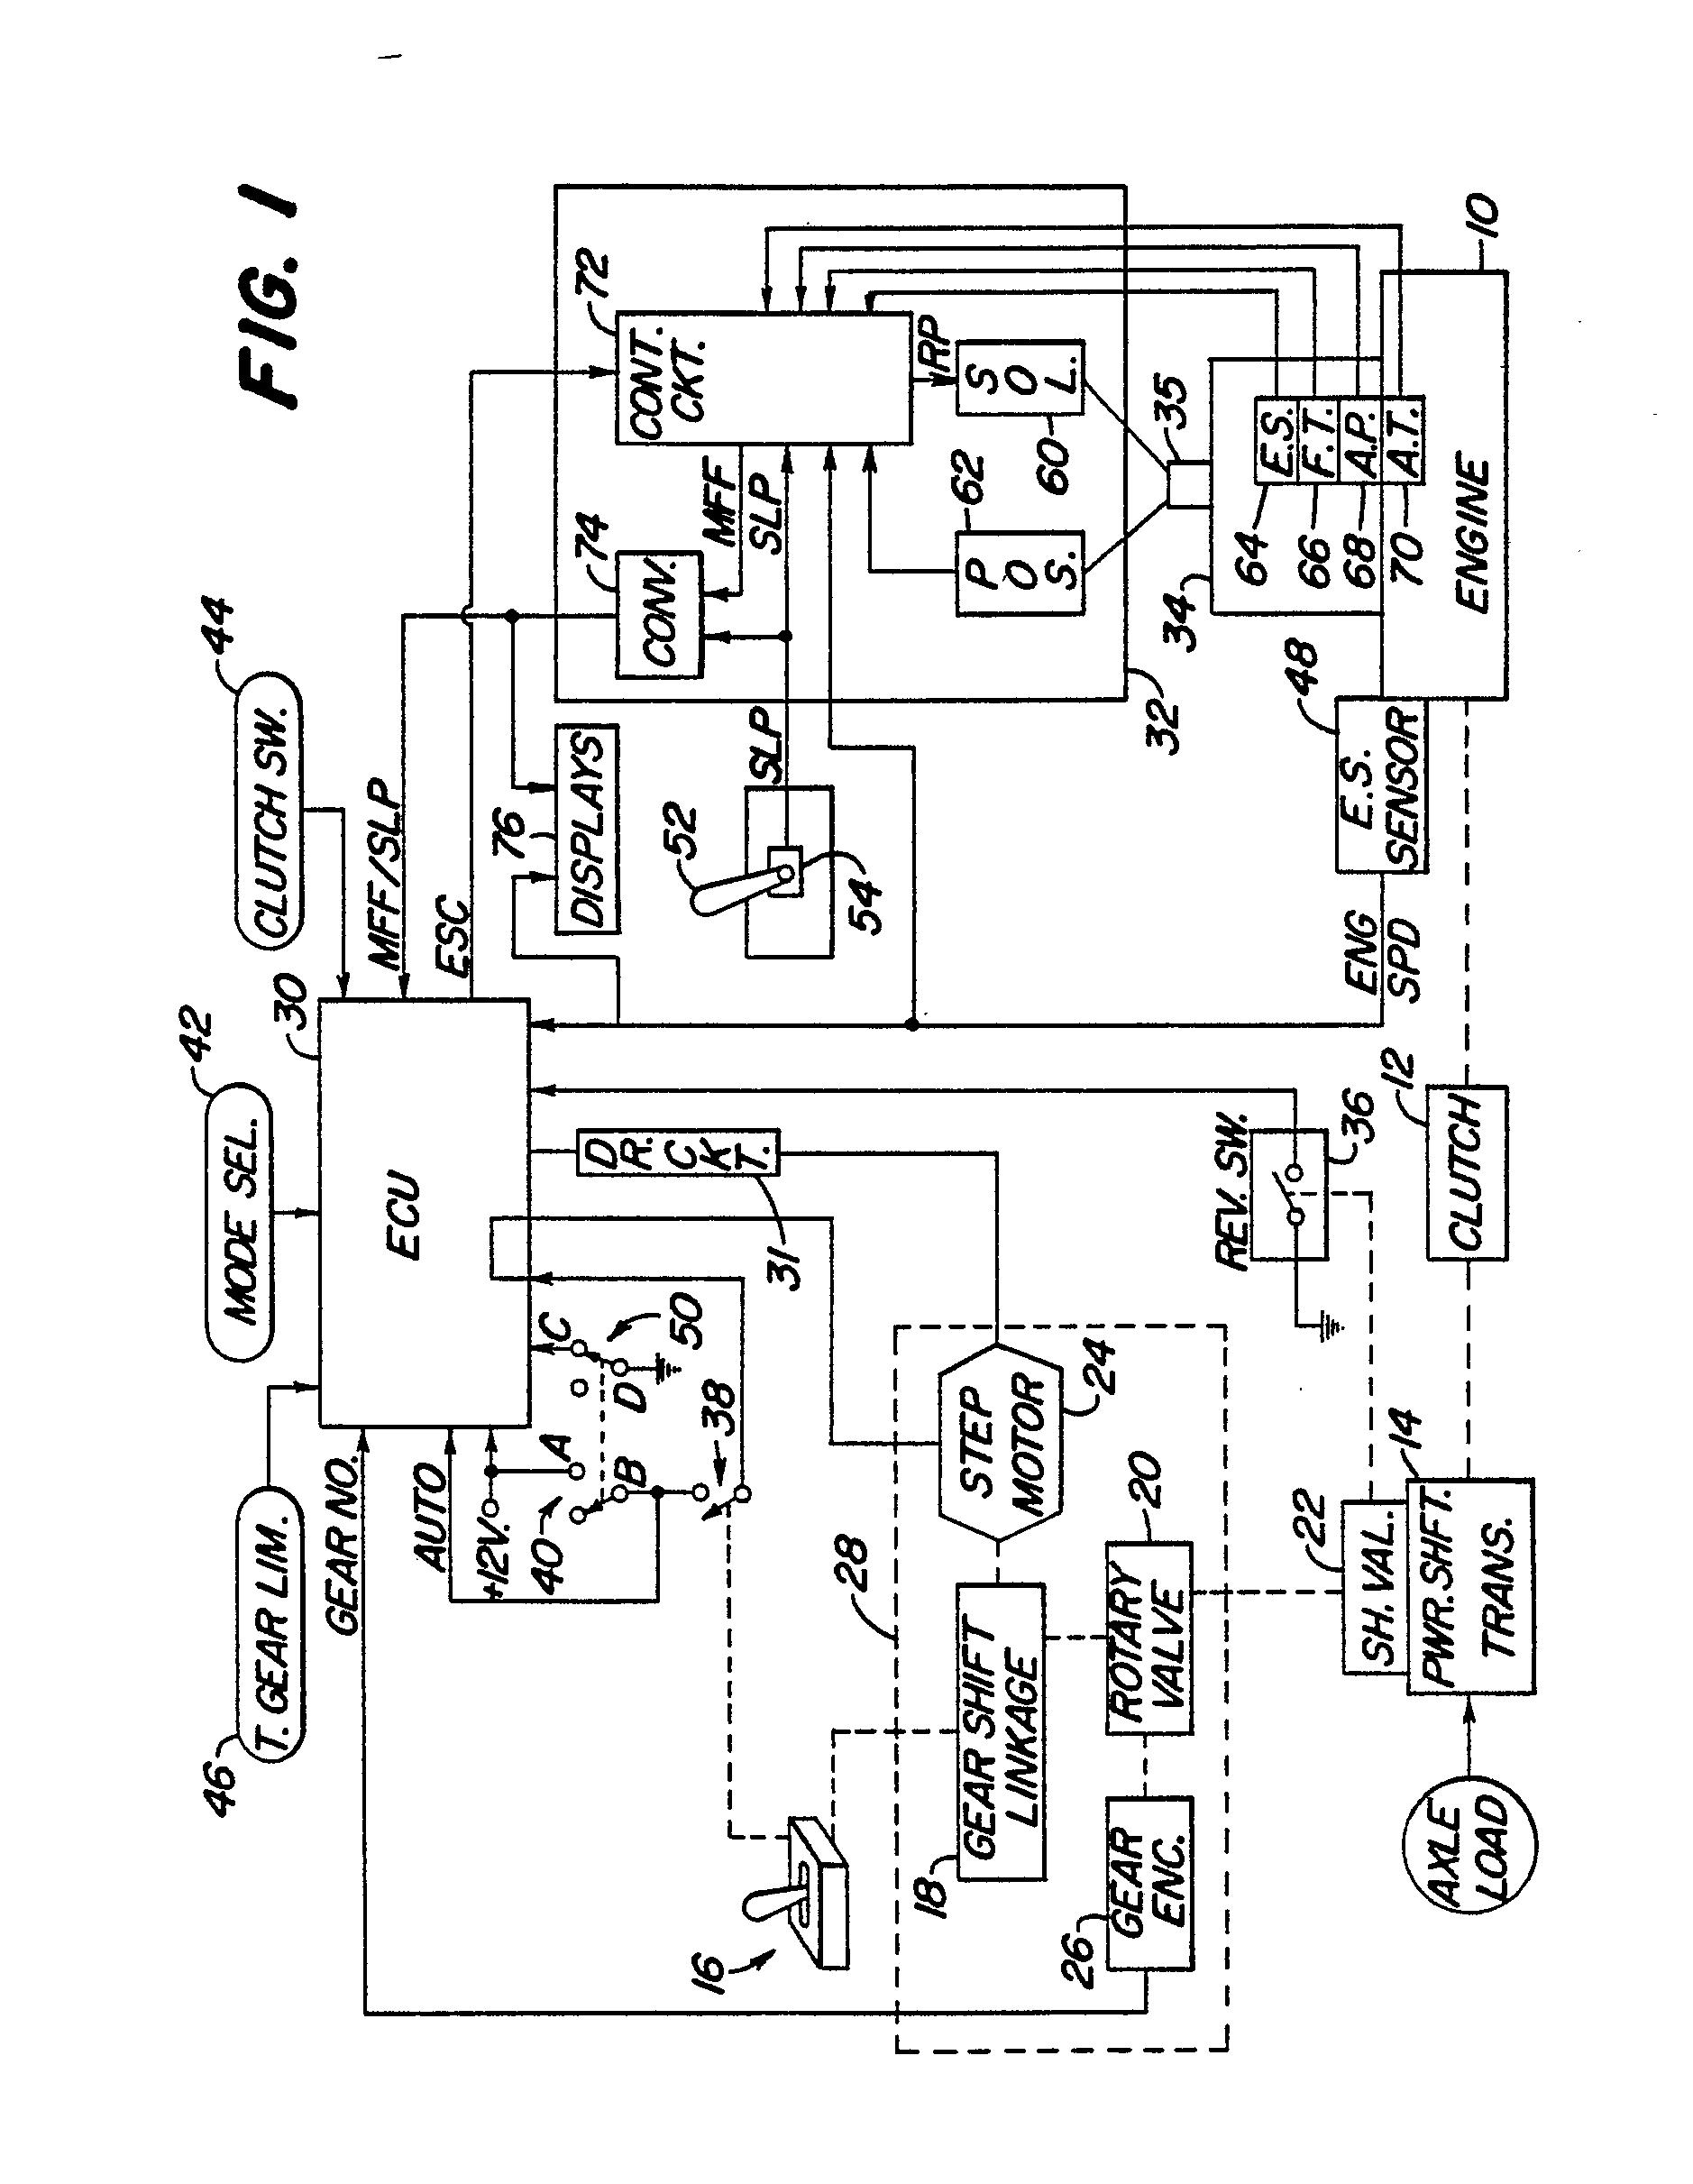 L14 20 Wiring Diagram Harness 220v Three Phase Wiring